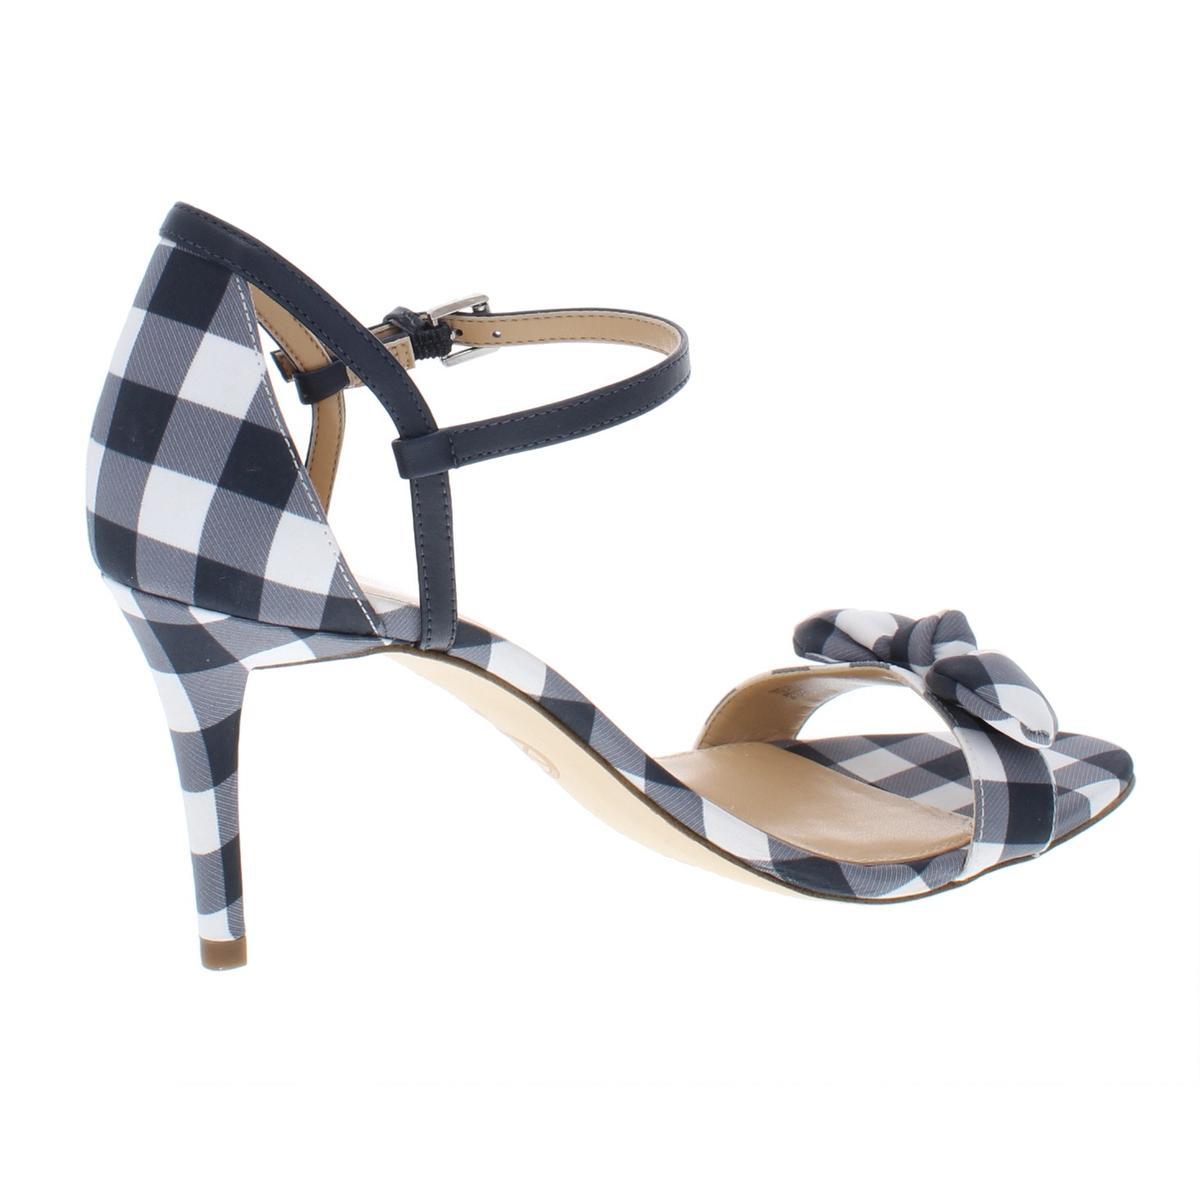 MICHAEL-Michael-Kors-Womens-Pippa-Gingham-Pumps-Dress-Sandals-Shoes-BHFO-5799 thumbnail 4